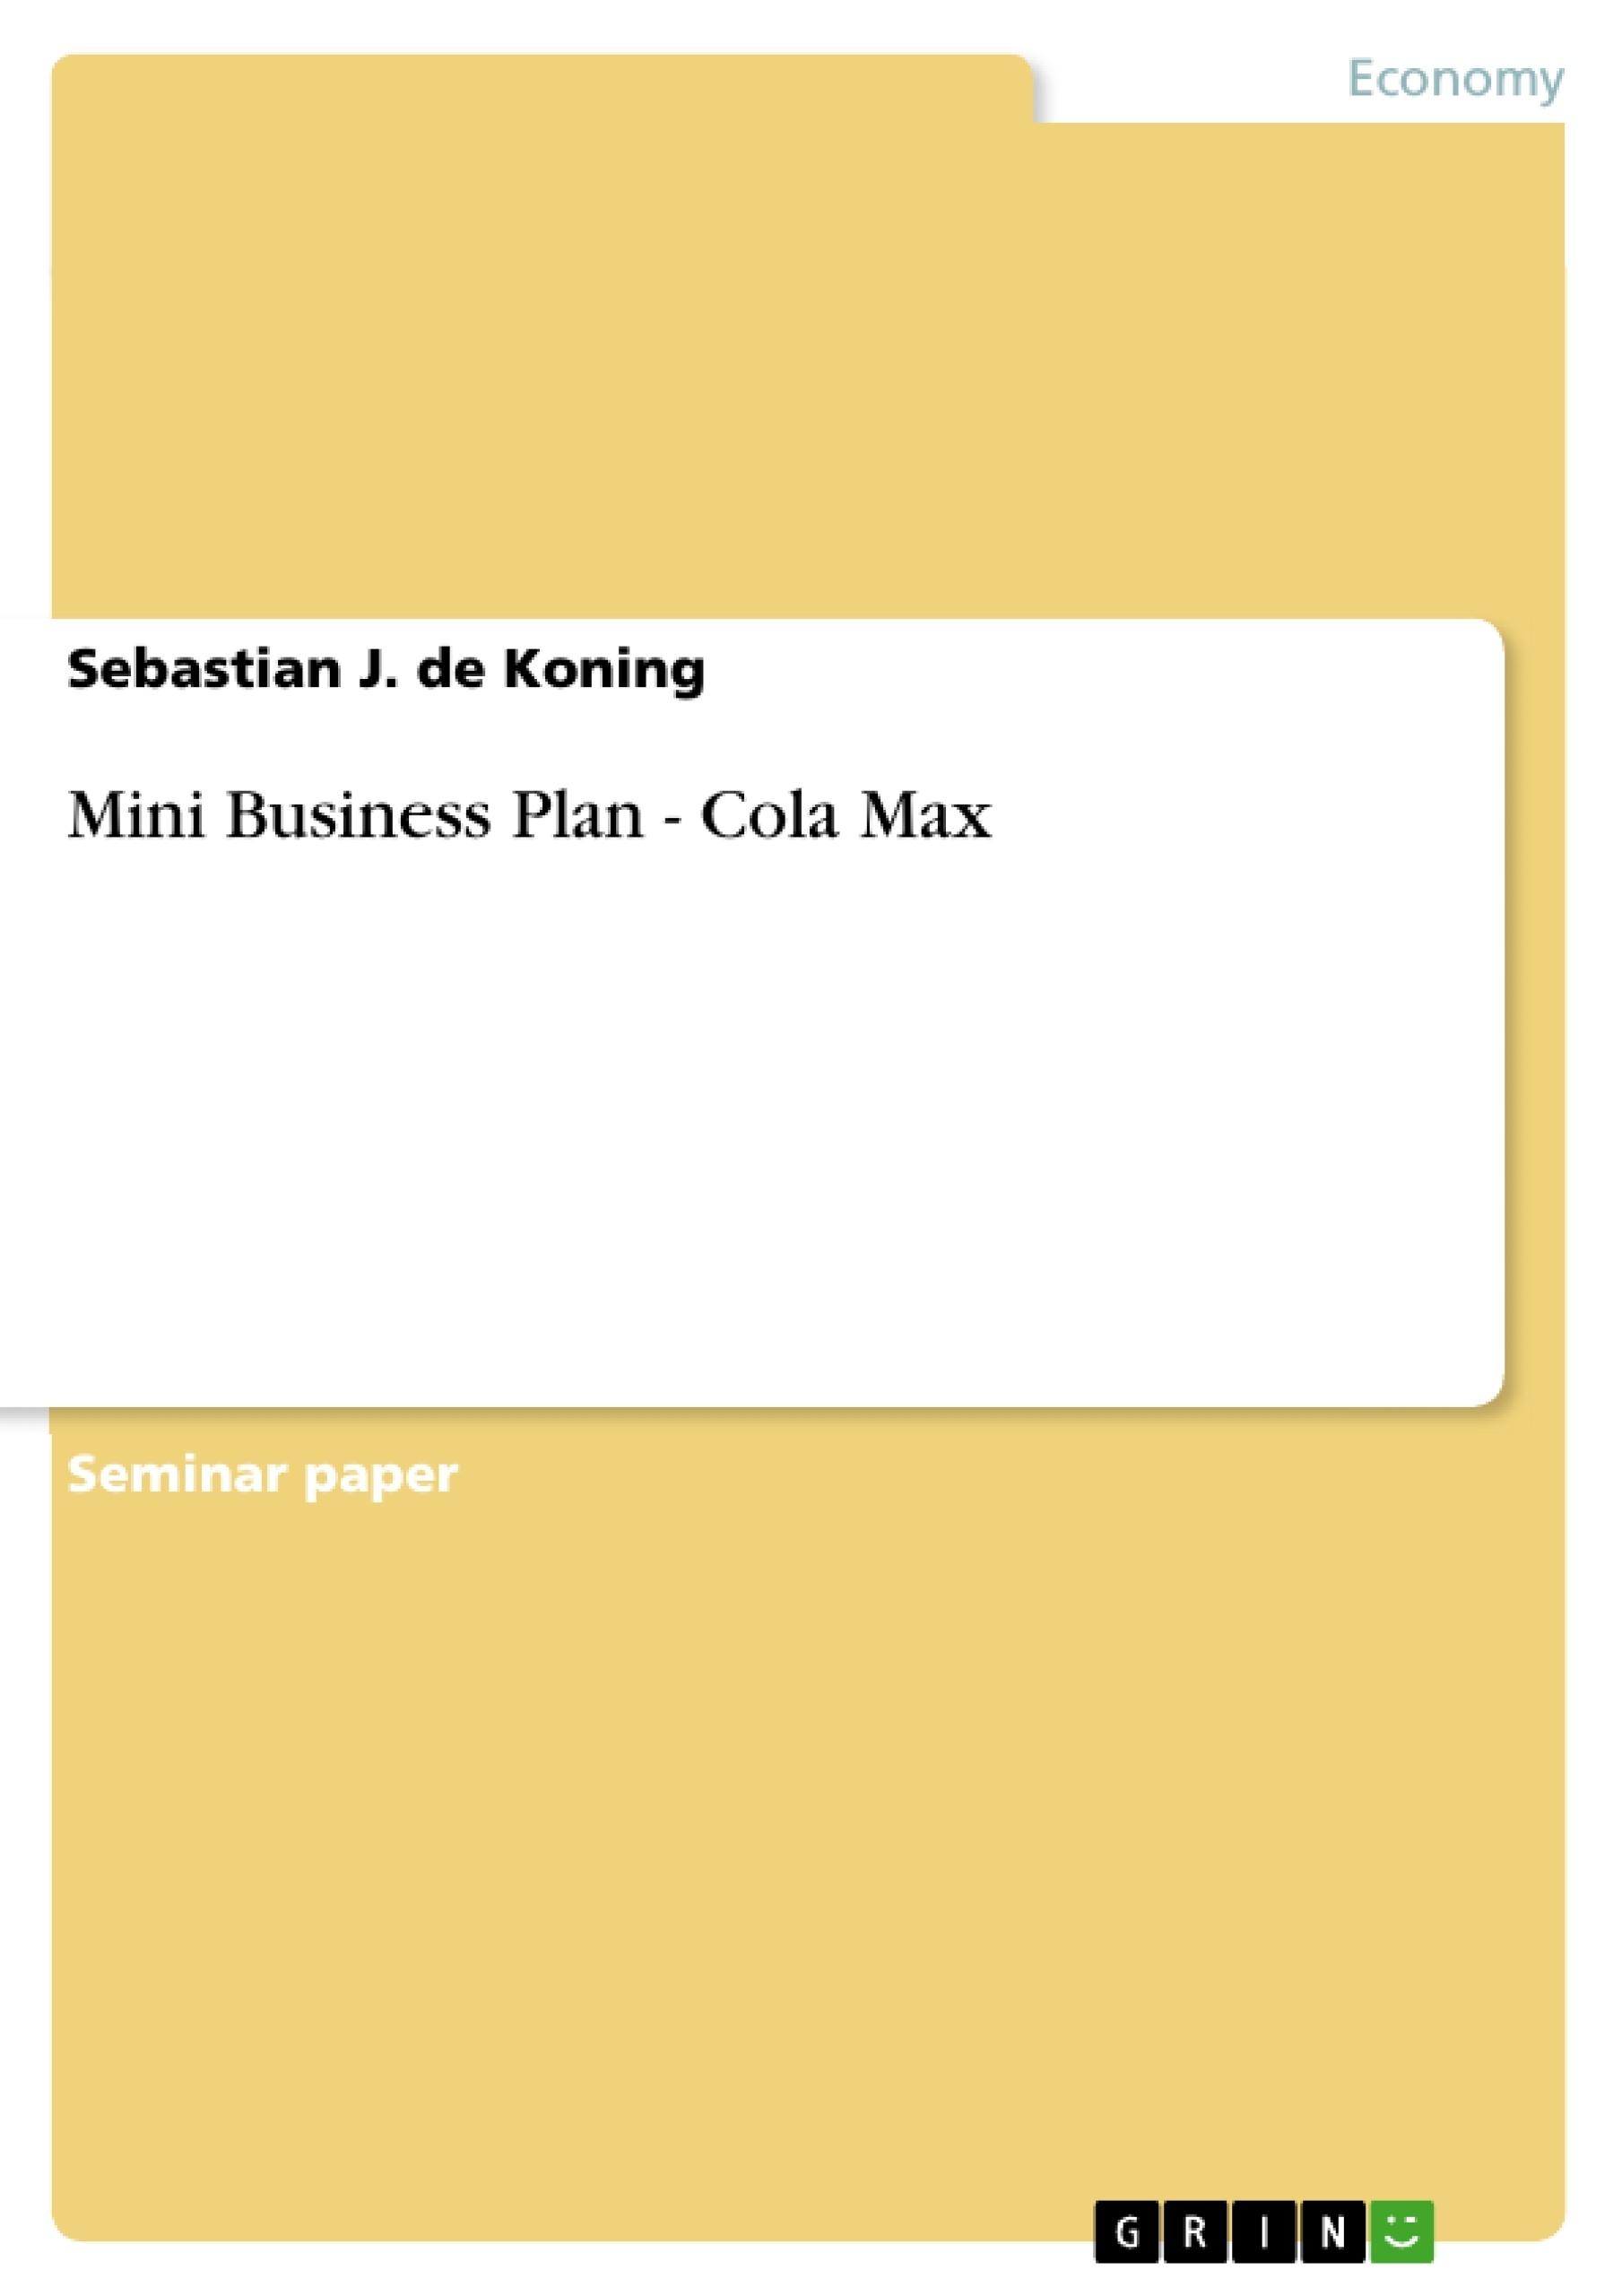 Title: Mini Business Plan - Cola Max